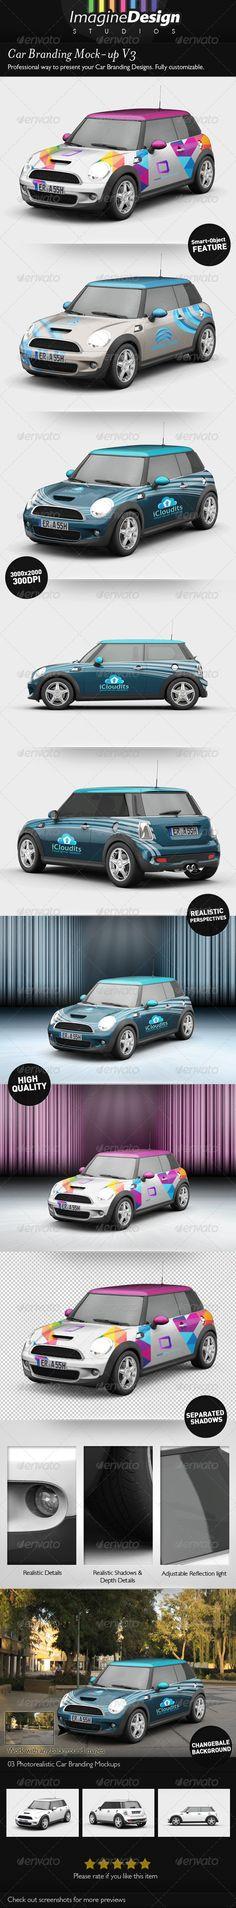 Car Branding Mock-up V3 Download here: https://graphicriver.net/item/car-branding-mockup-v3/5394107?ref=KlitVogli